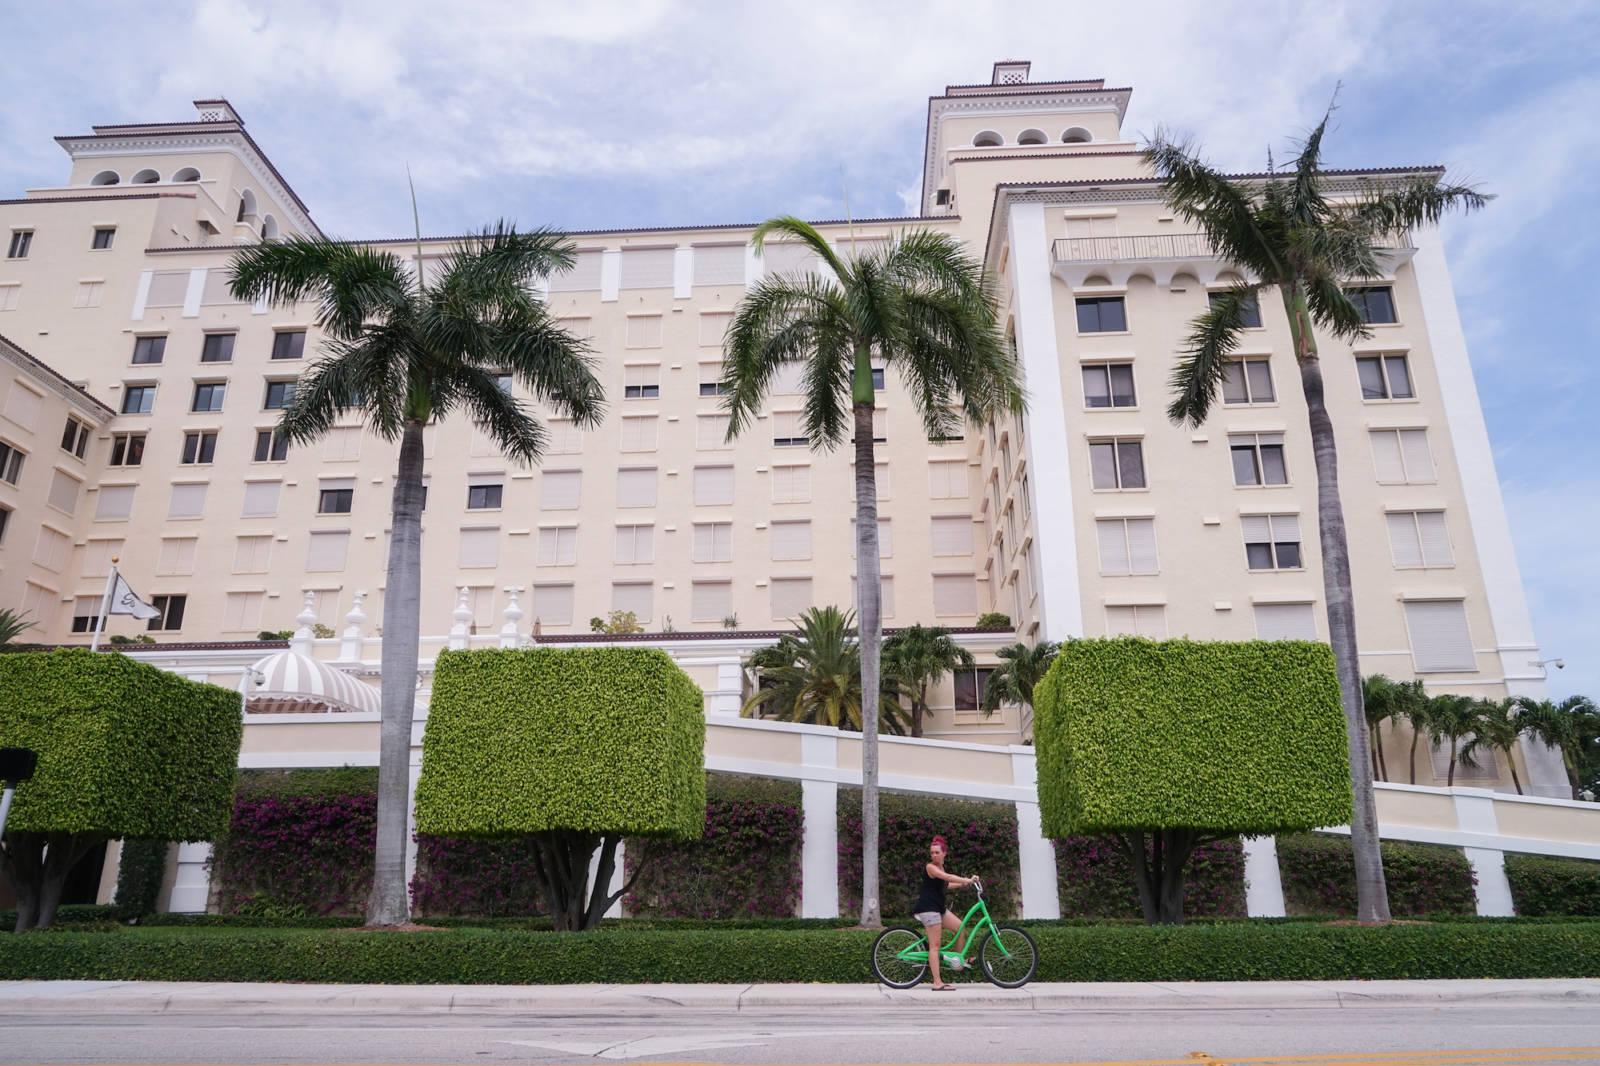 Bike Riding in Palm Beach Florida_2